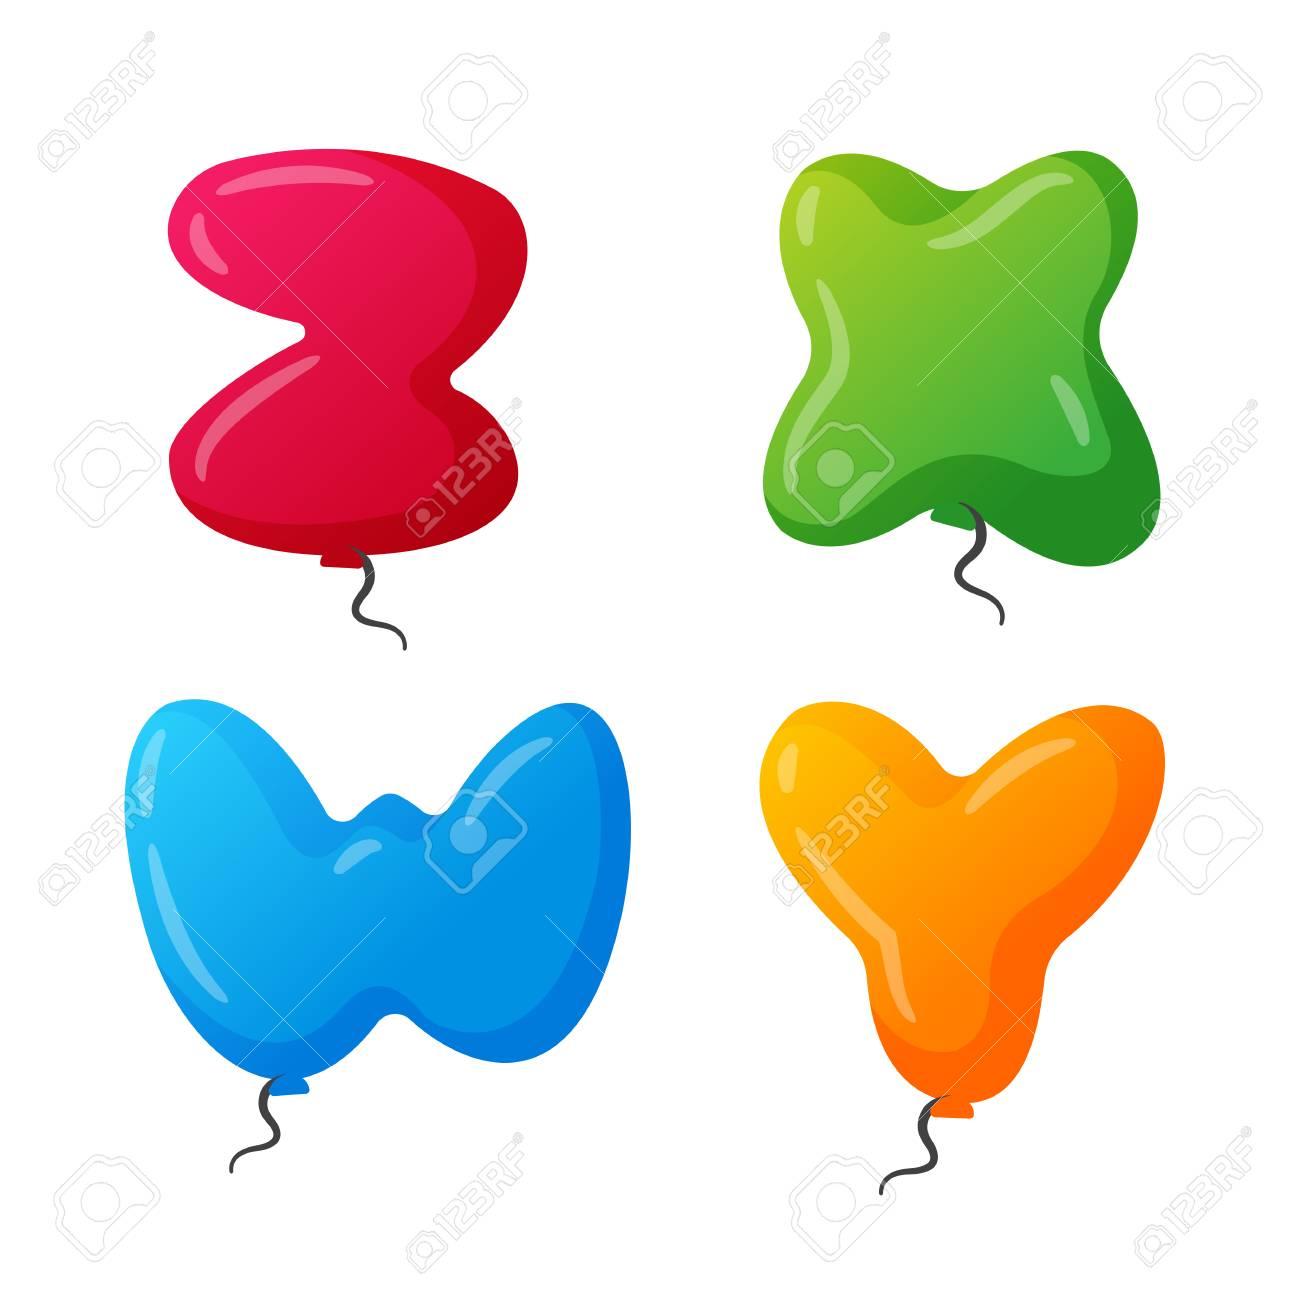 English balloon colorful alphabet on white background holidays english balloon colorful alphabet on white background holidays and education ozone type greeting helium m4hsunfo